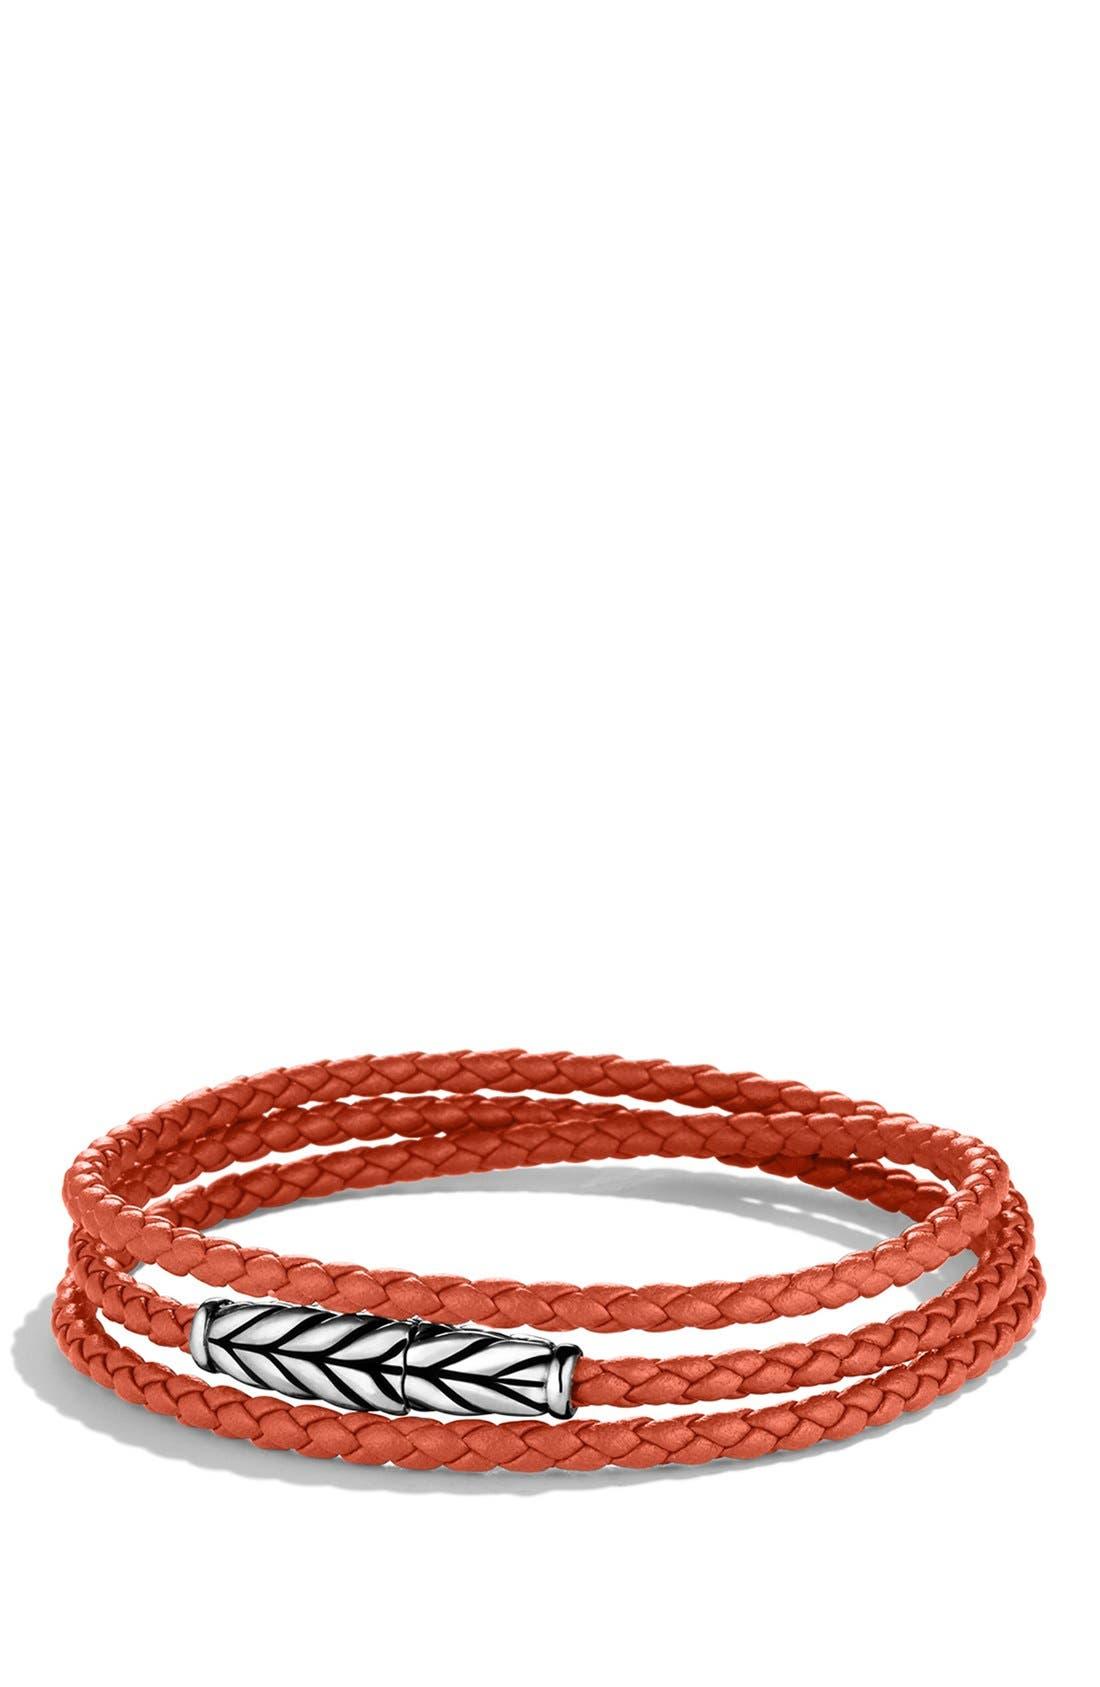 Alternate Image 1 Selected - David Yurman 'Chevron' Triple-Wrap Bracelet